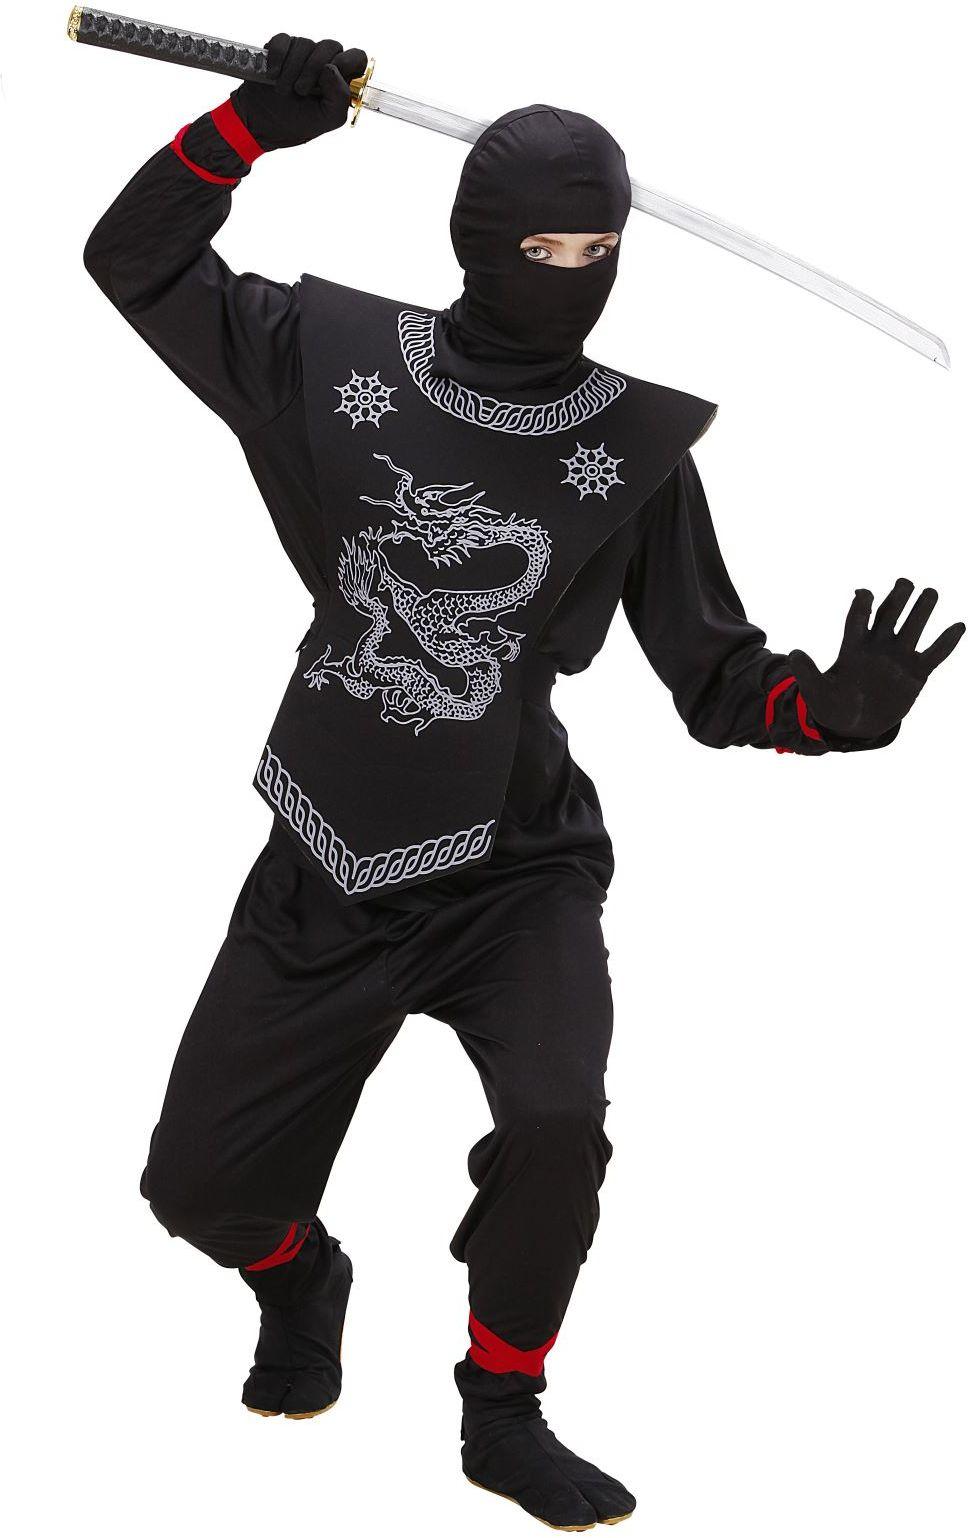 Stoere zwarte ninja